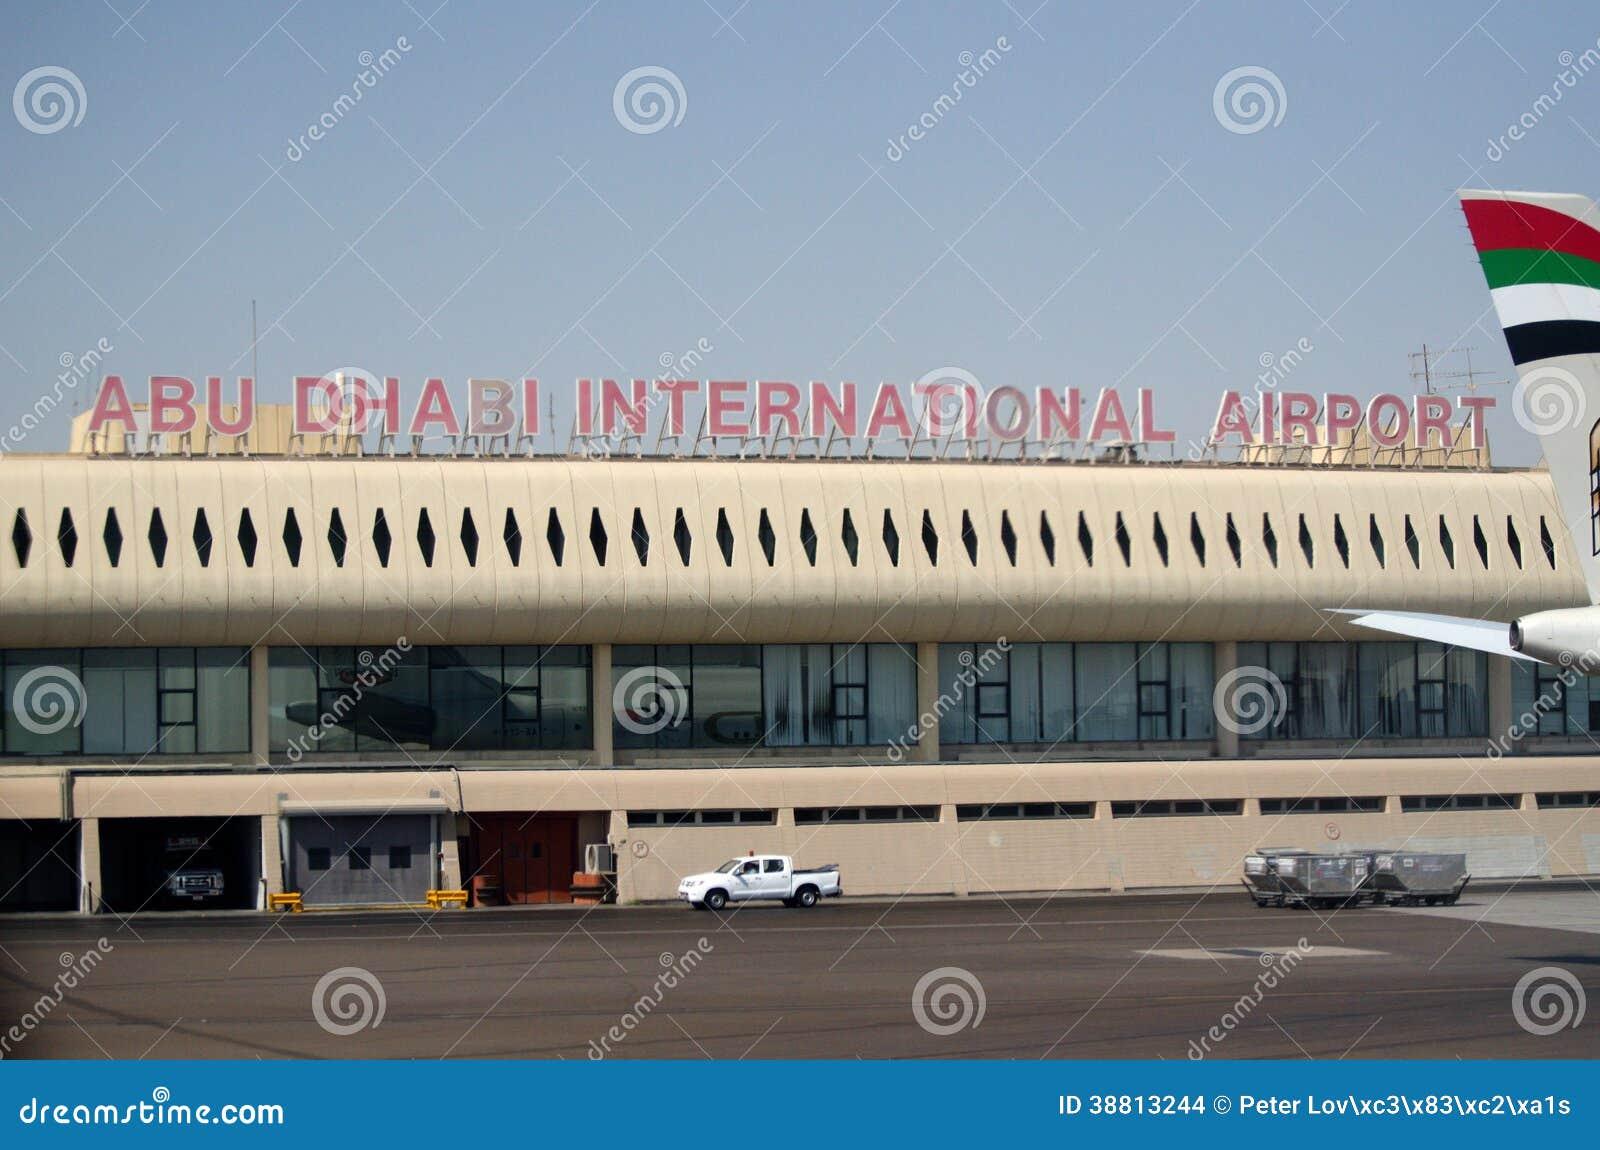 Abu dhabi international airport editorial stock image for International decor company abu dhabi